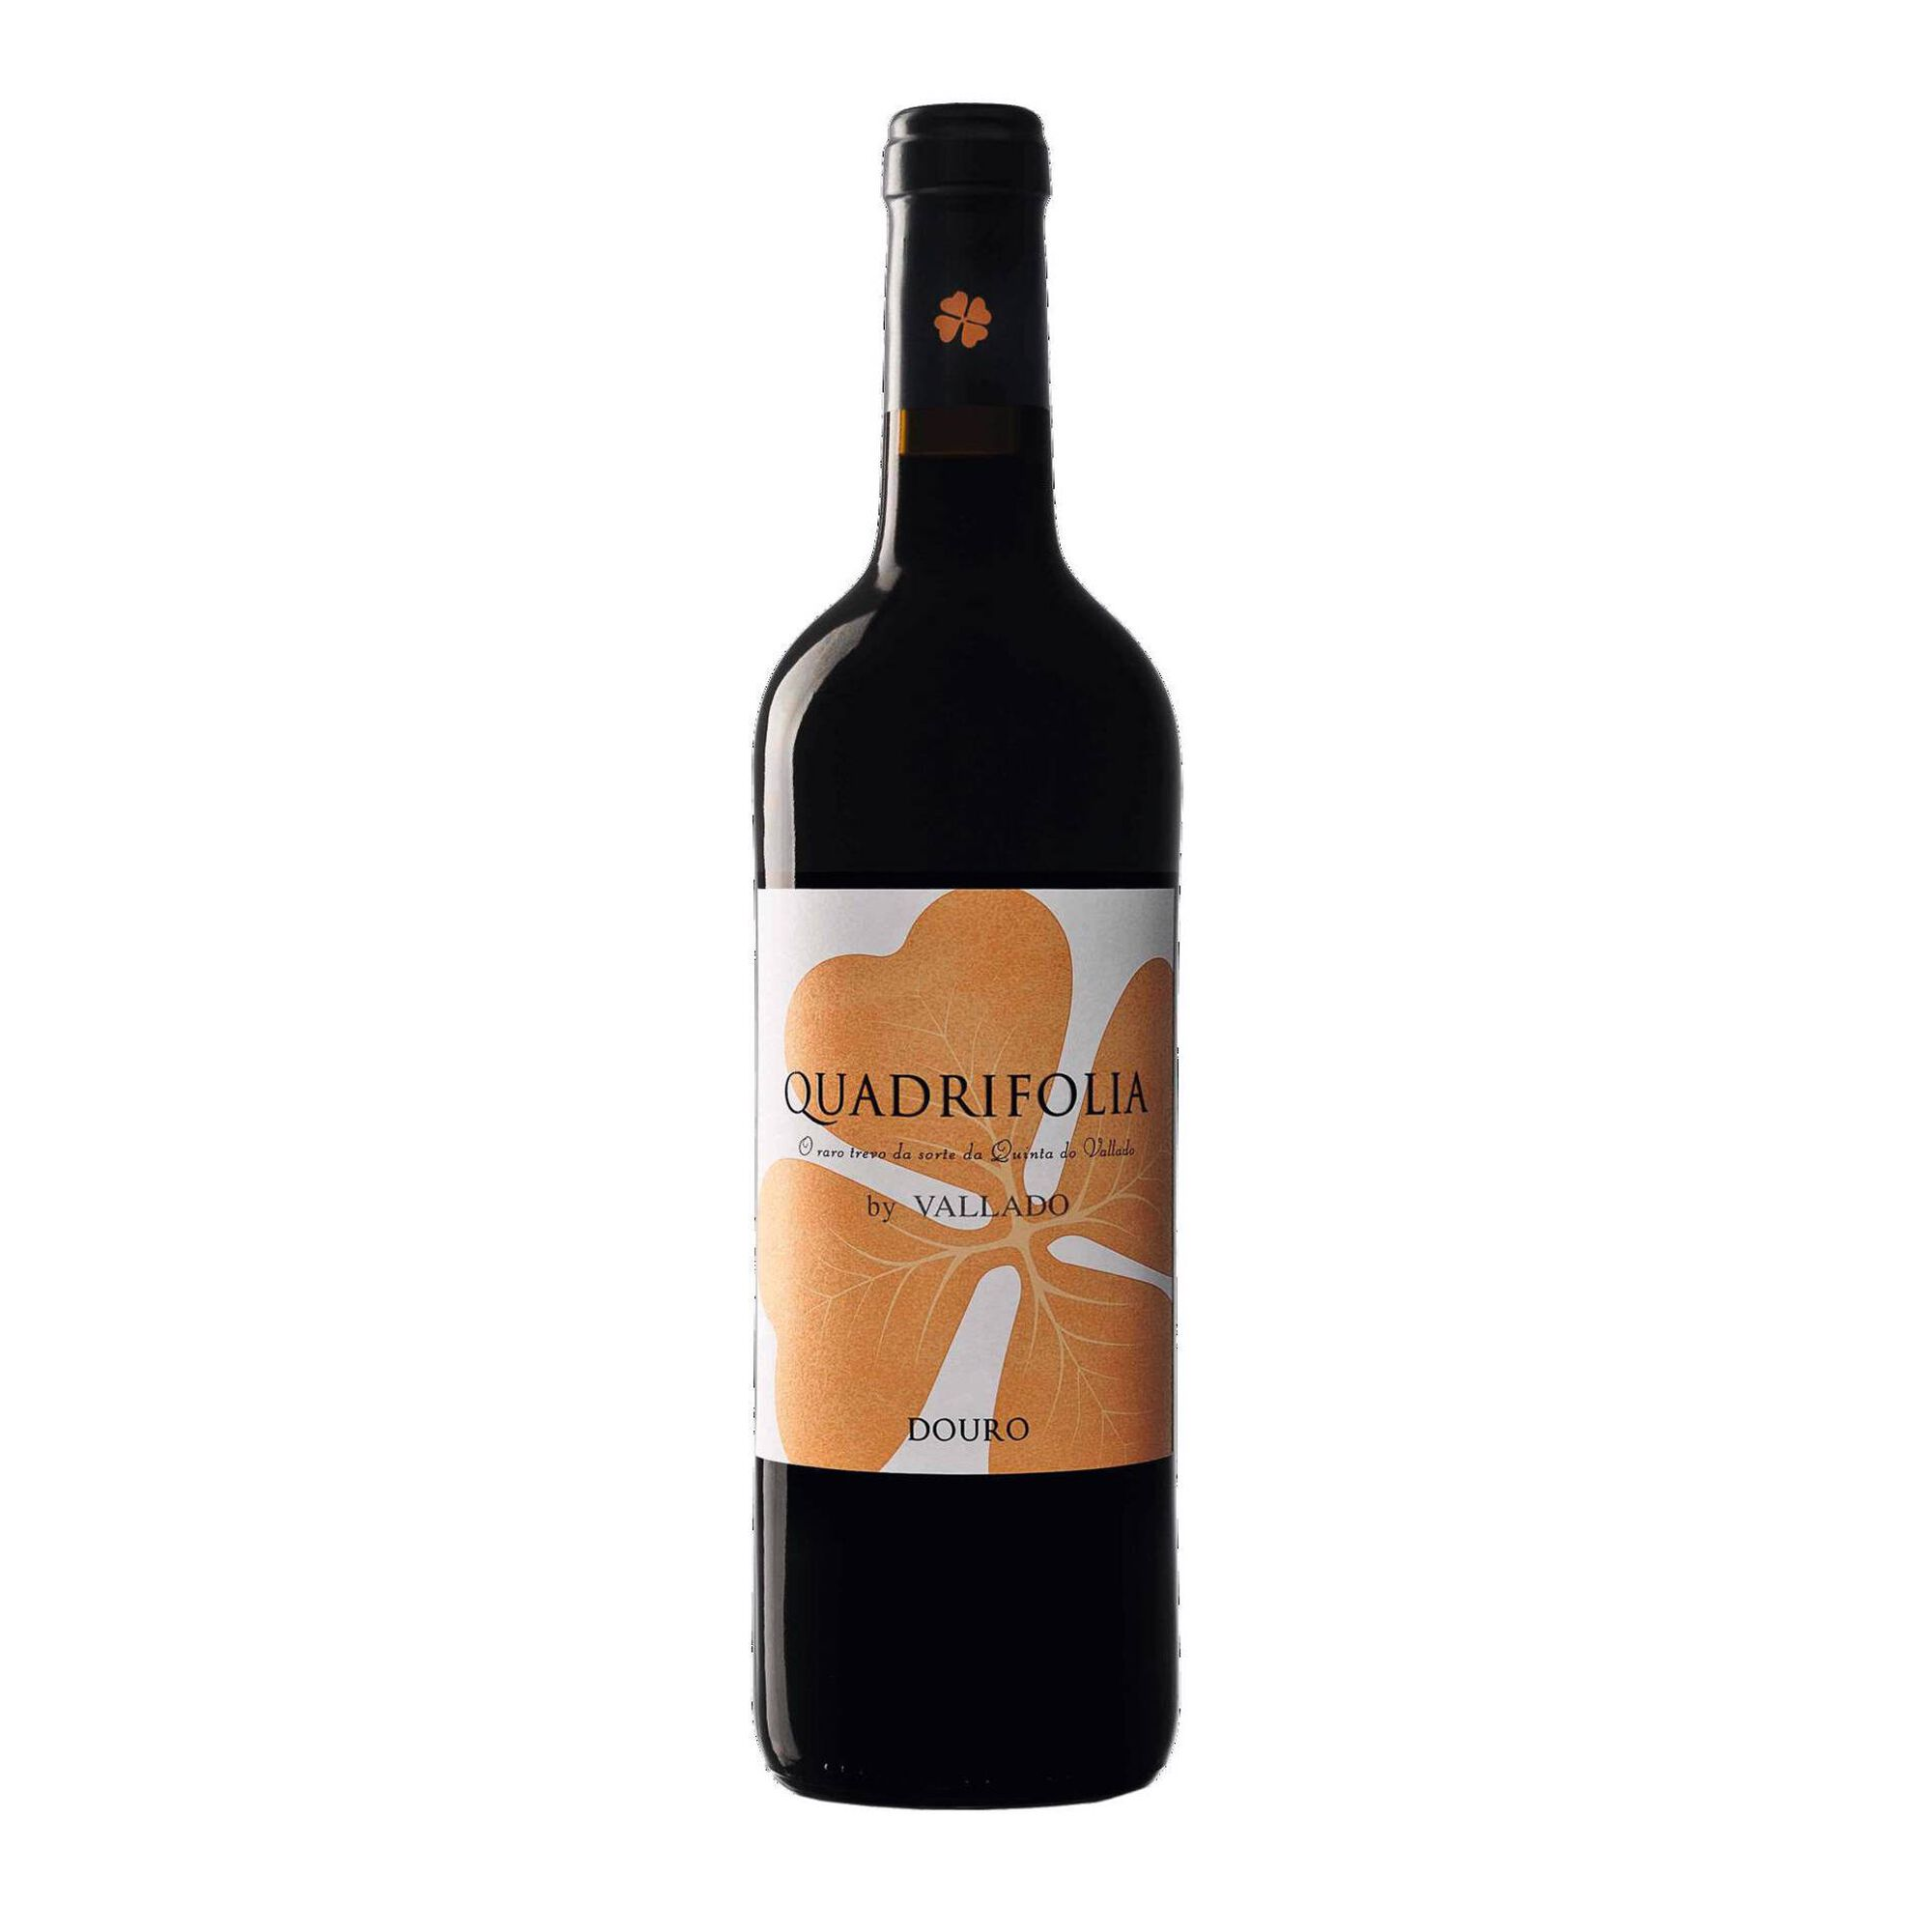 Quadrifolia By Vallado DOC Douro Vinho Tinto